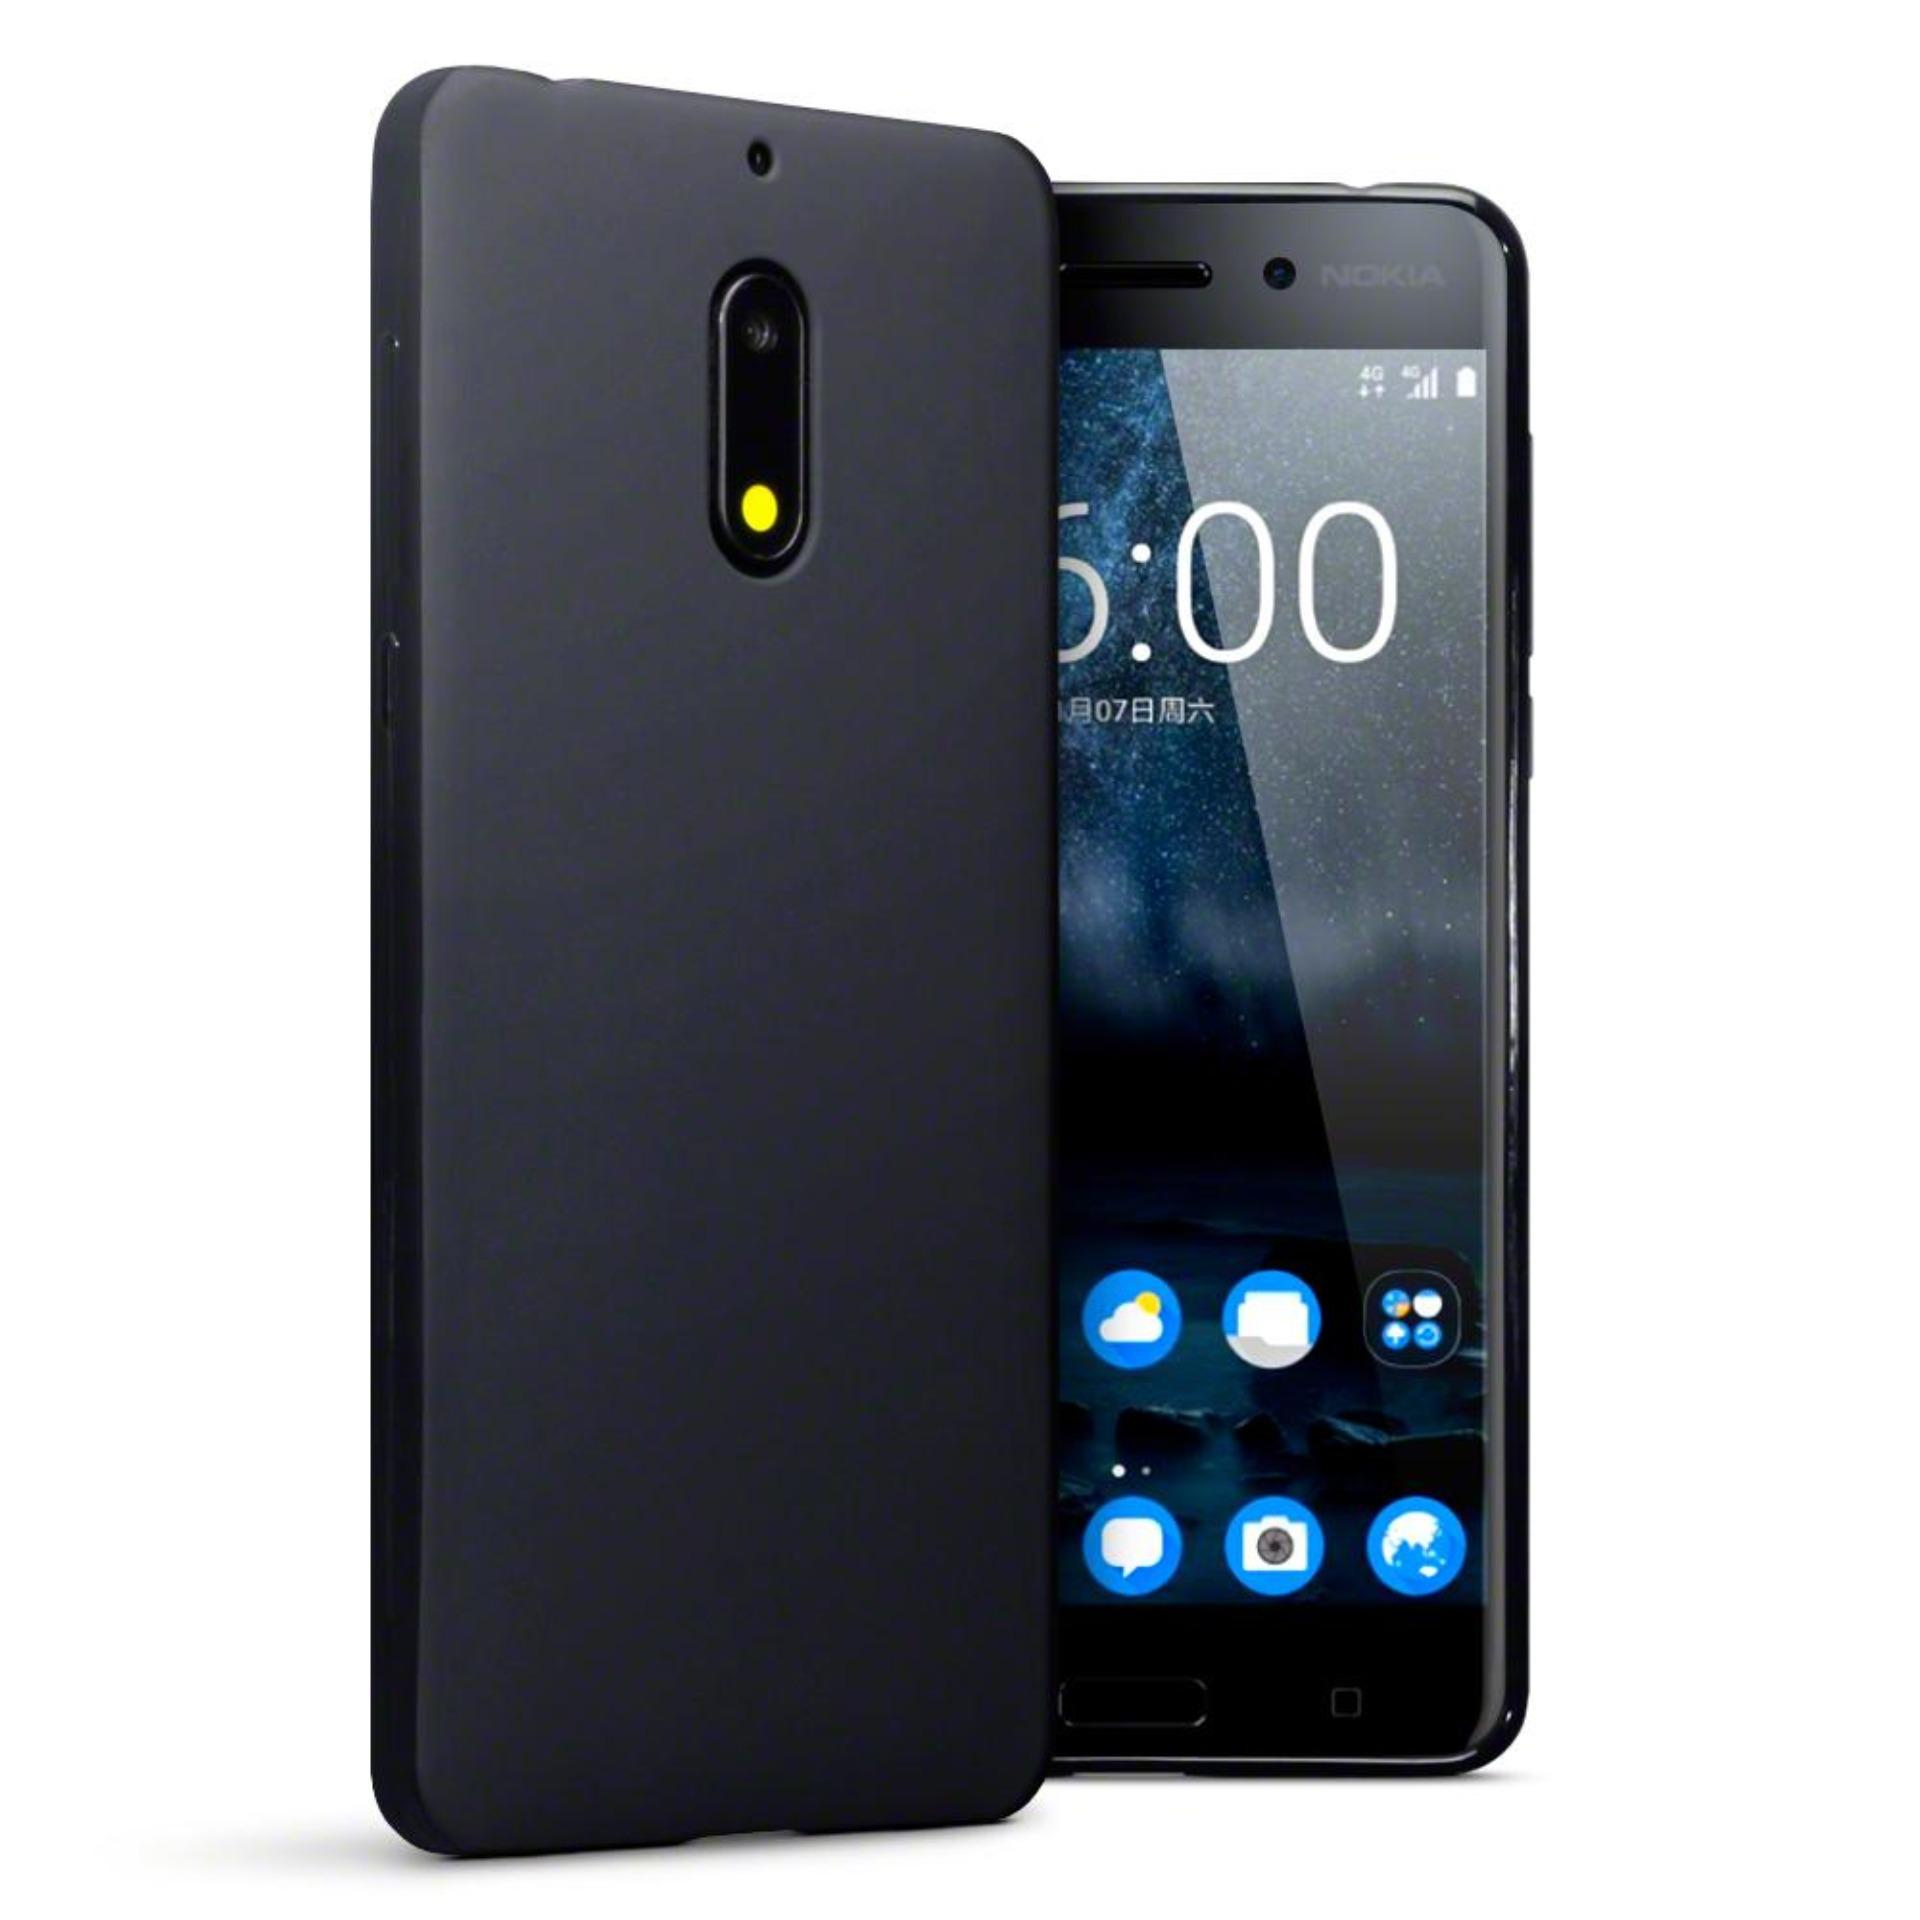 Case Slim Black Matte Xiaomi Nokia 6 Baby Skin Softcase Ultra Thin Jelly Silikon Babyskin